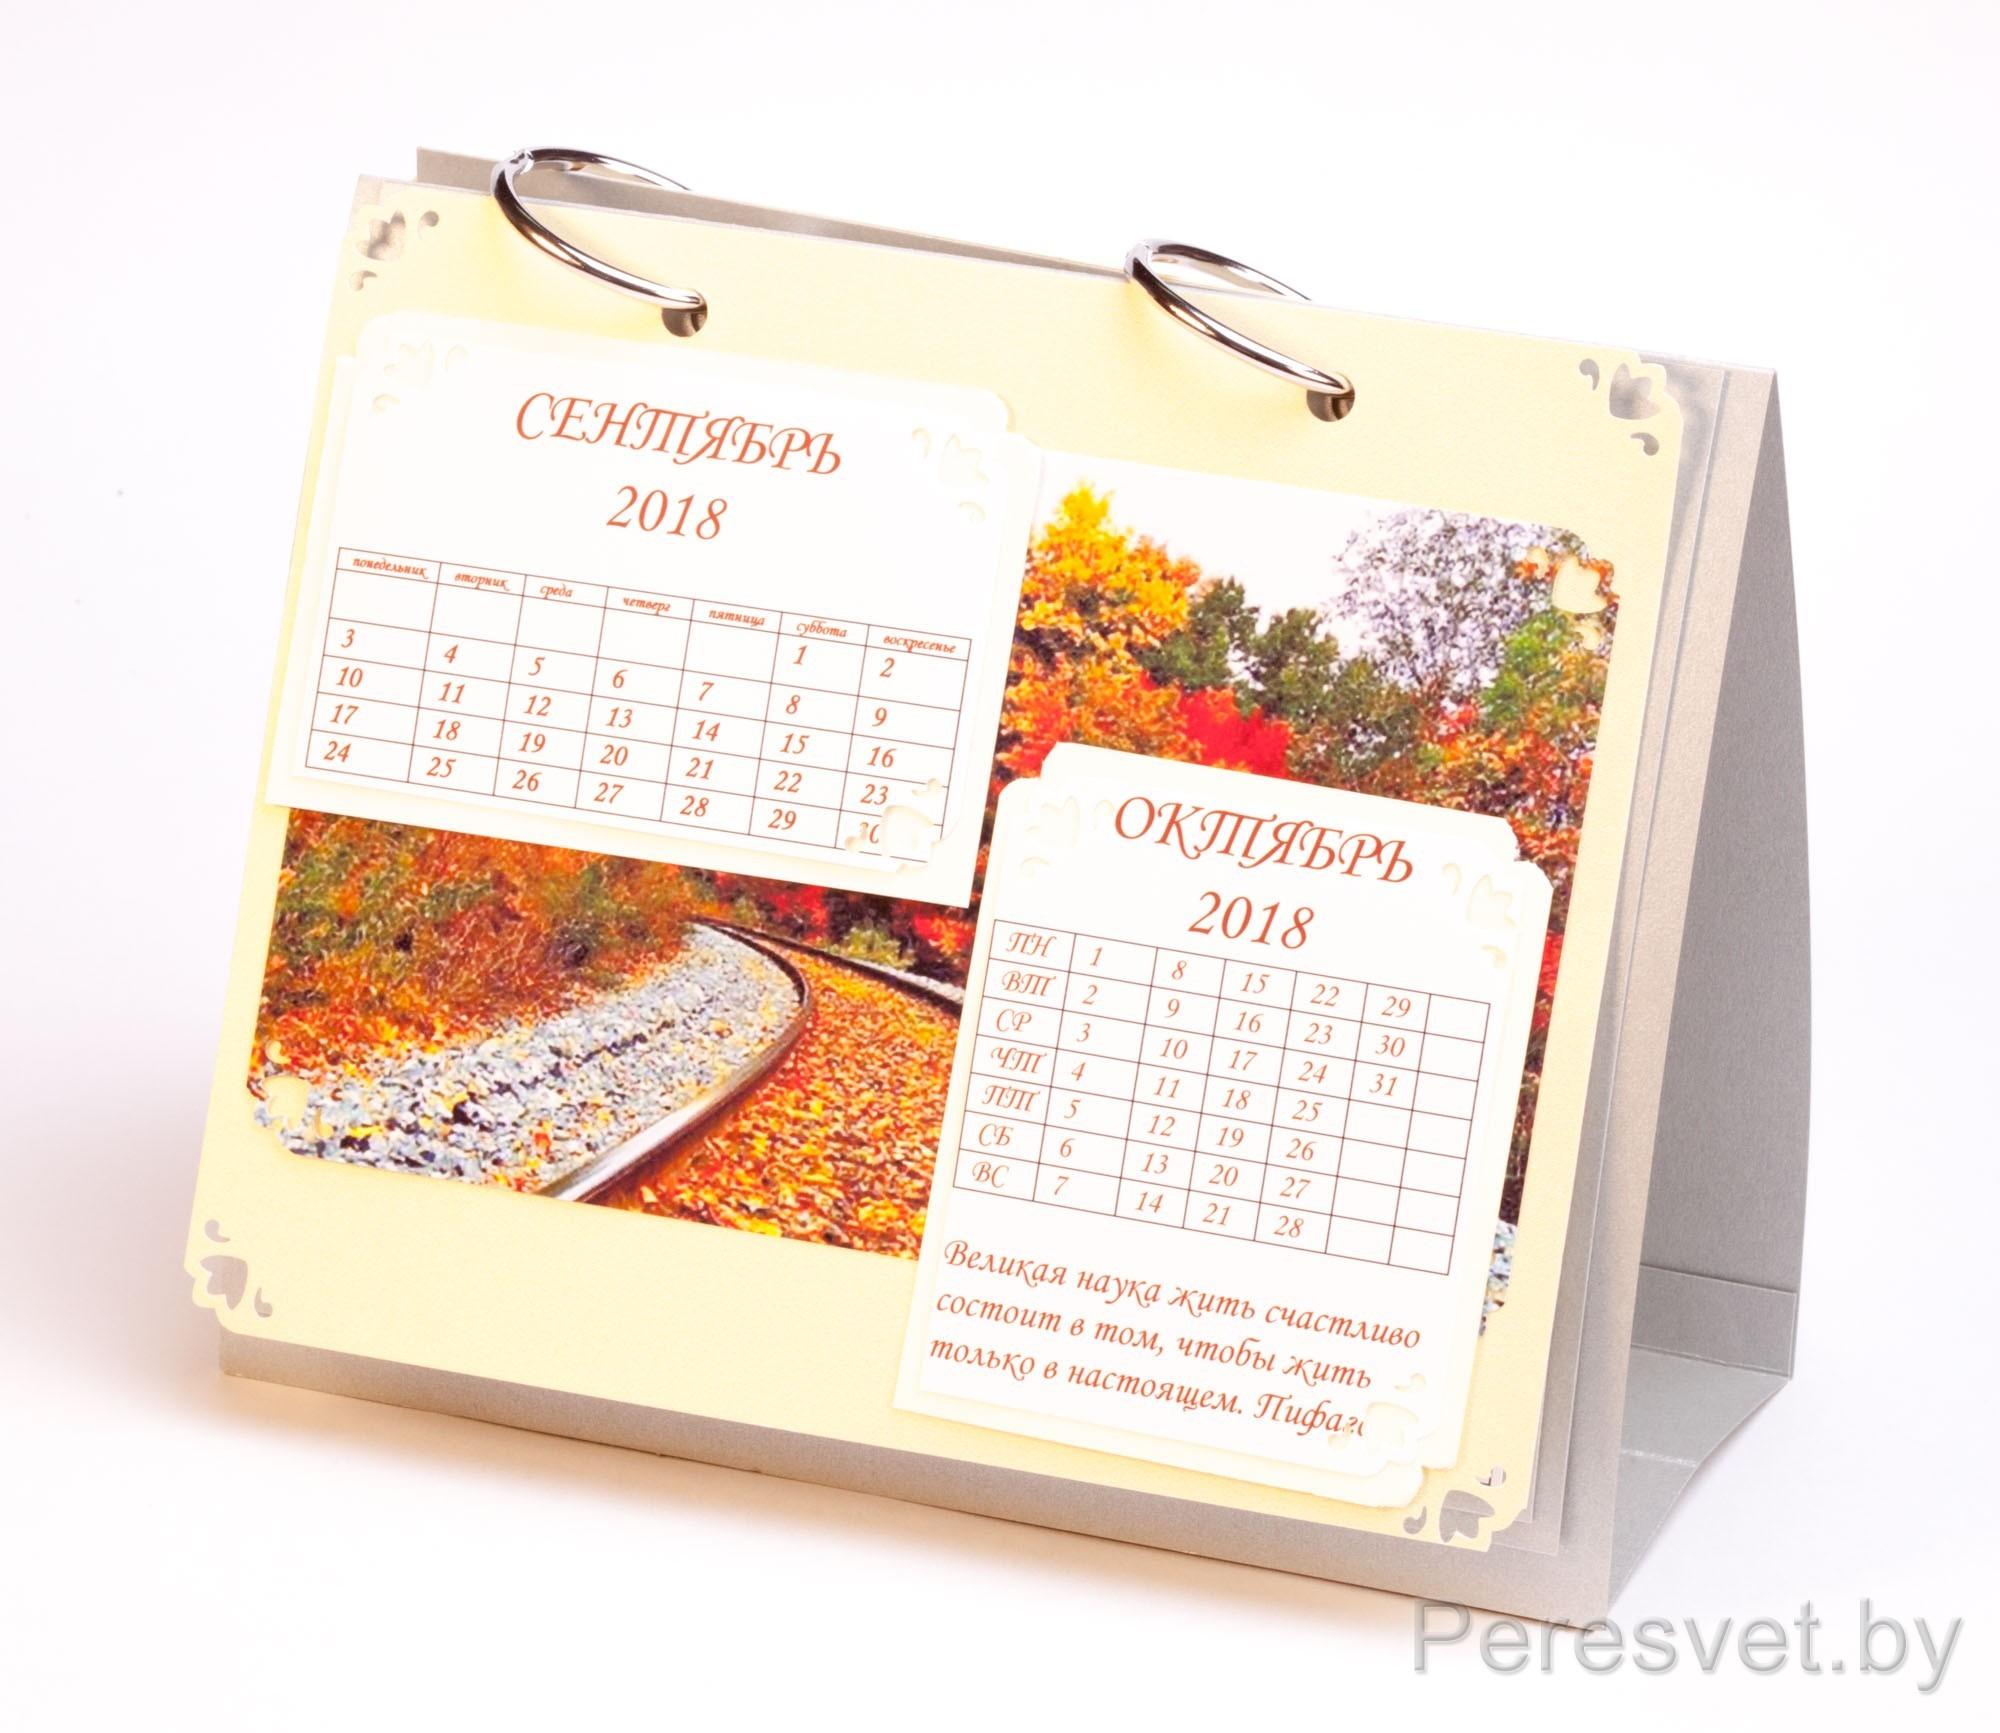 Картинка календаря перекидного